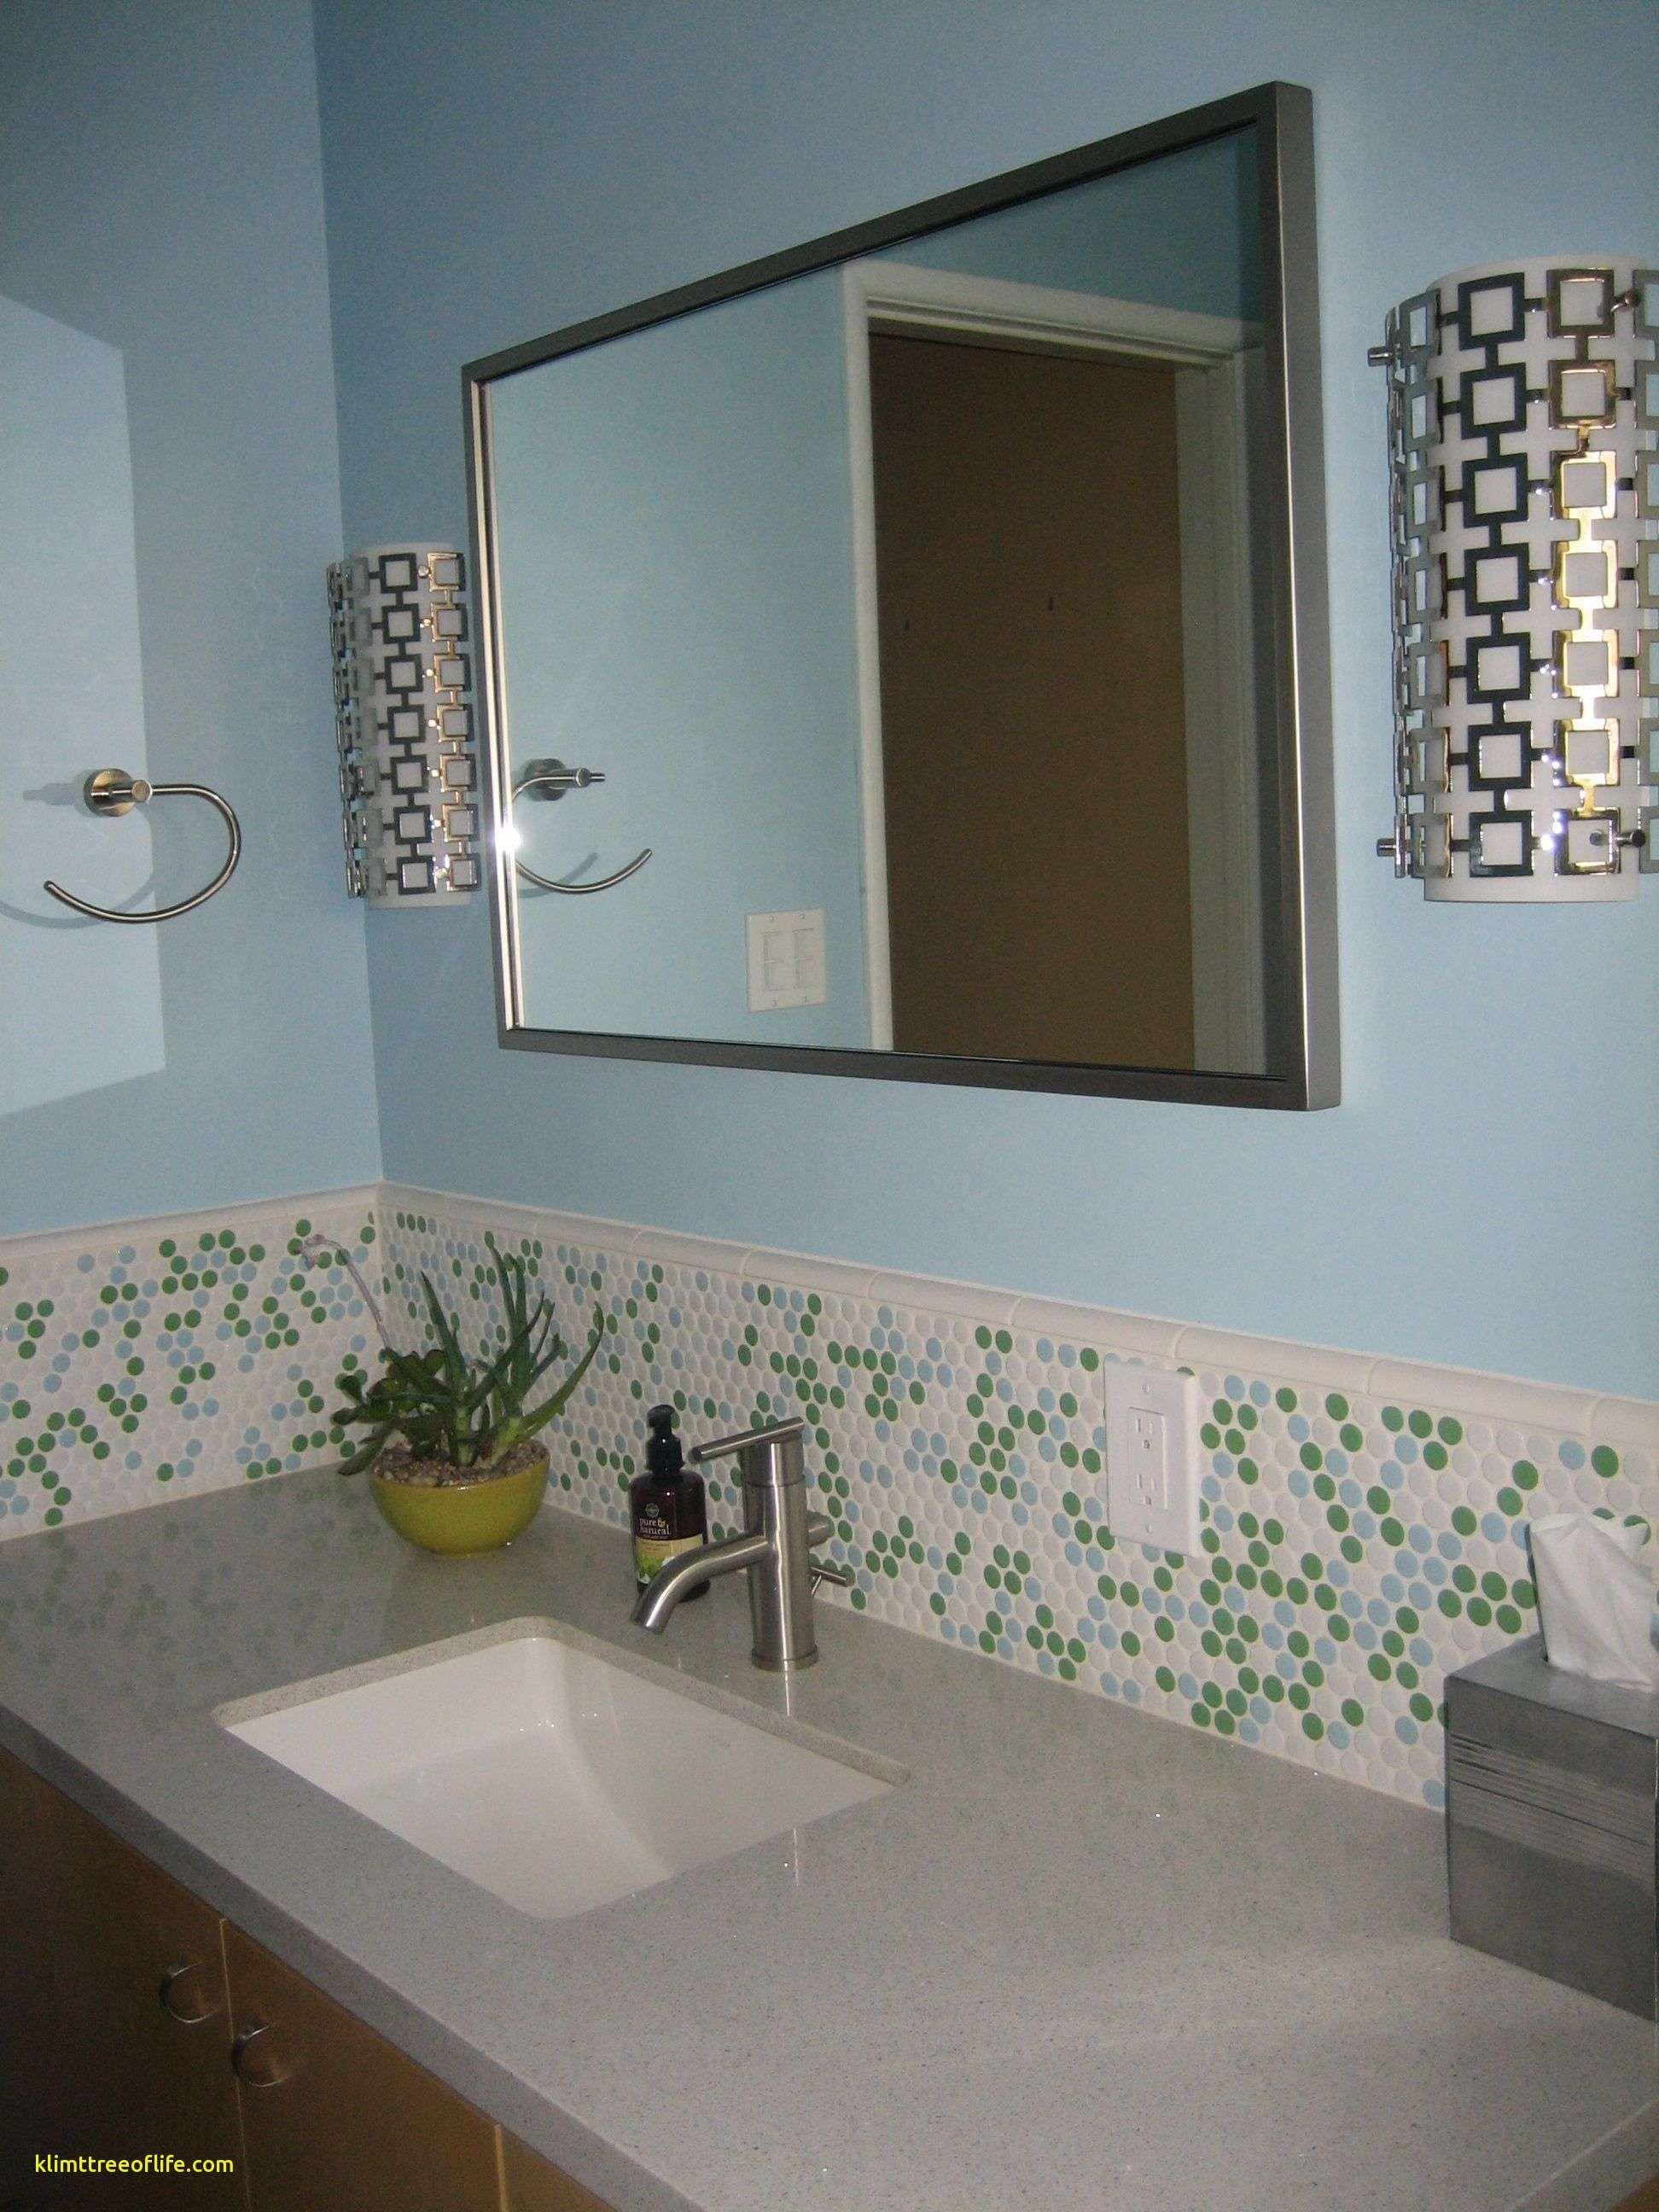 Round Glass Tile Backsplash Ideas Tile Backsplash Bathroom